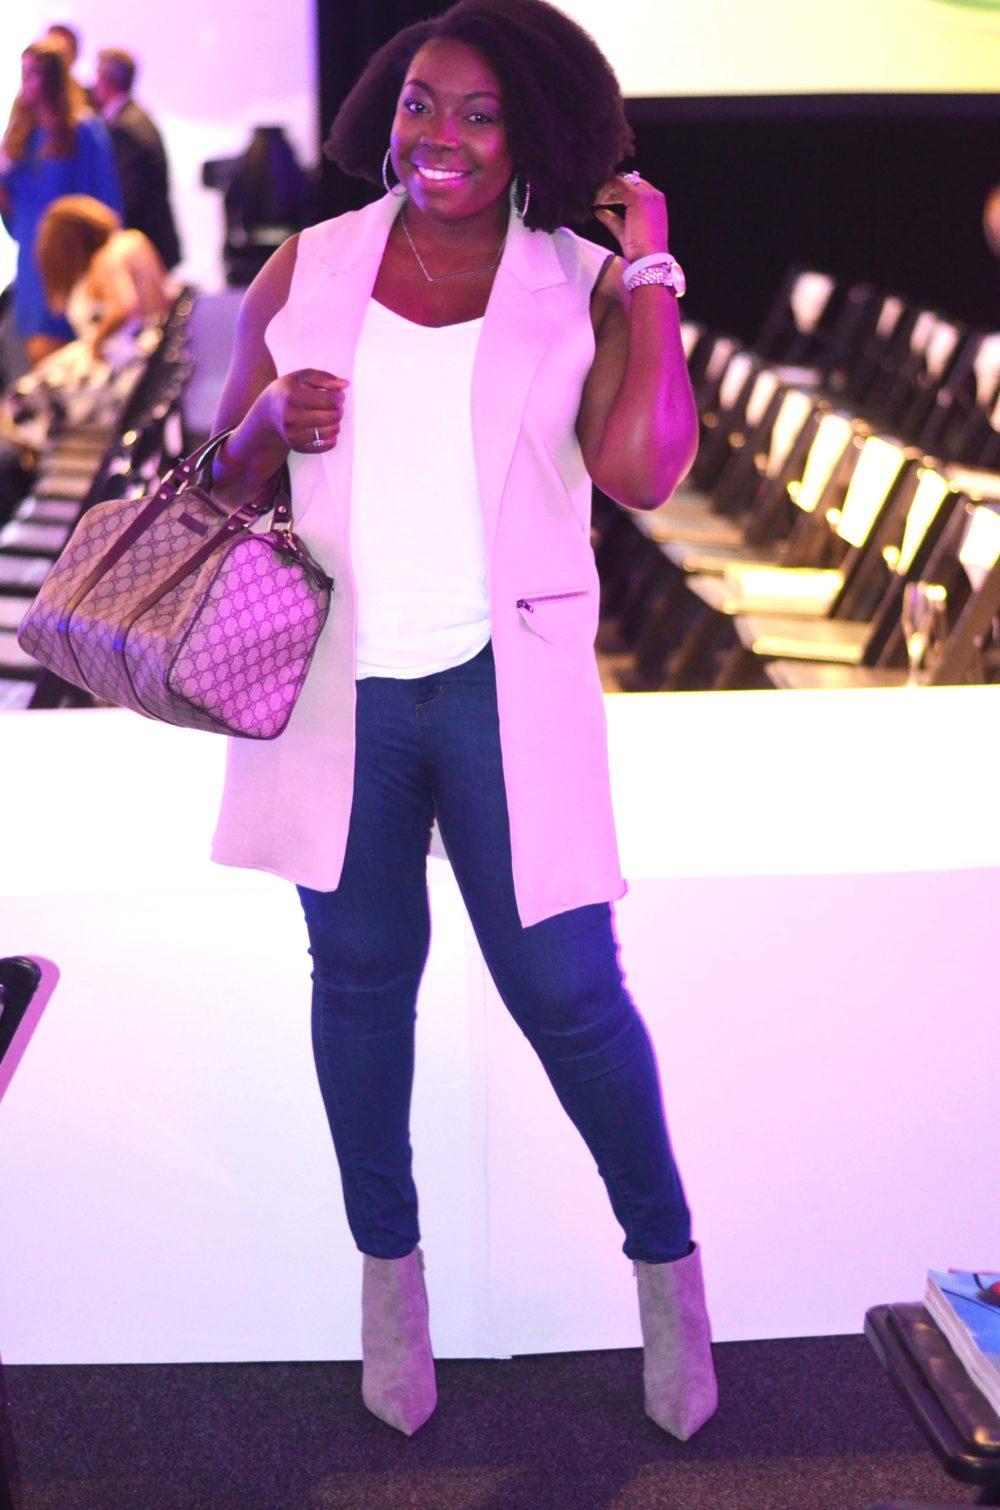 Vogue + Houston Galleria Fashion Show